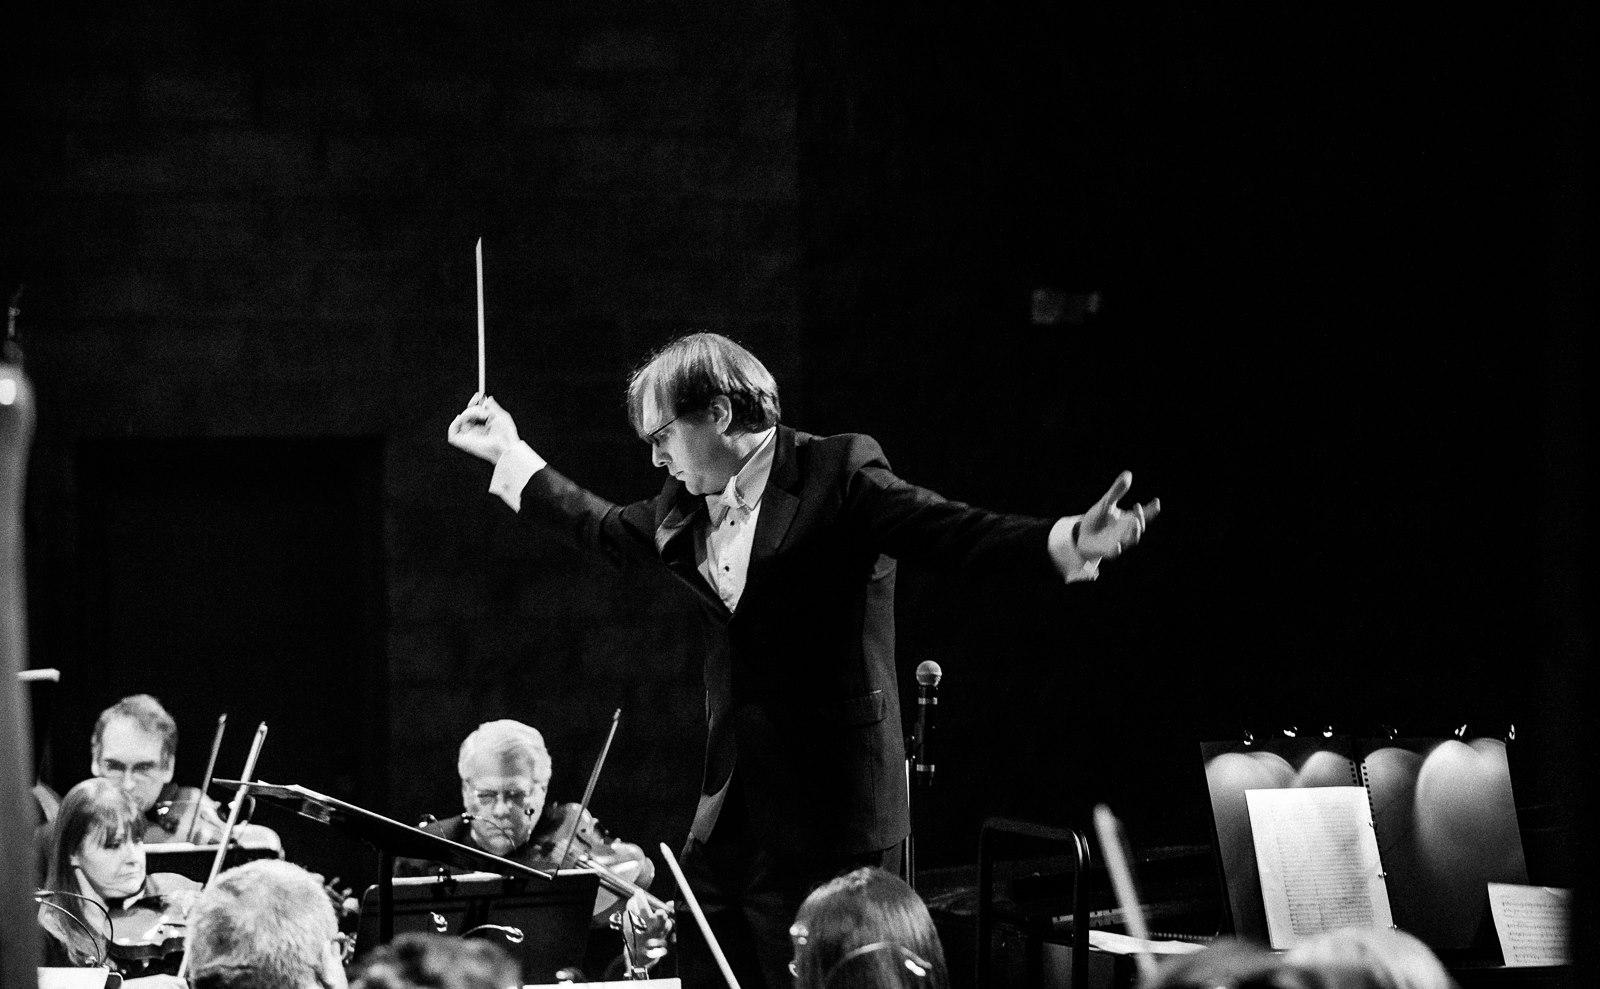 zen-and-the-art-of-music-david-michael-wolff